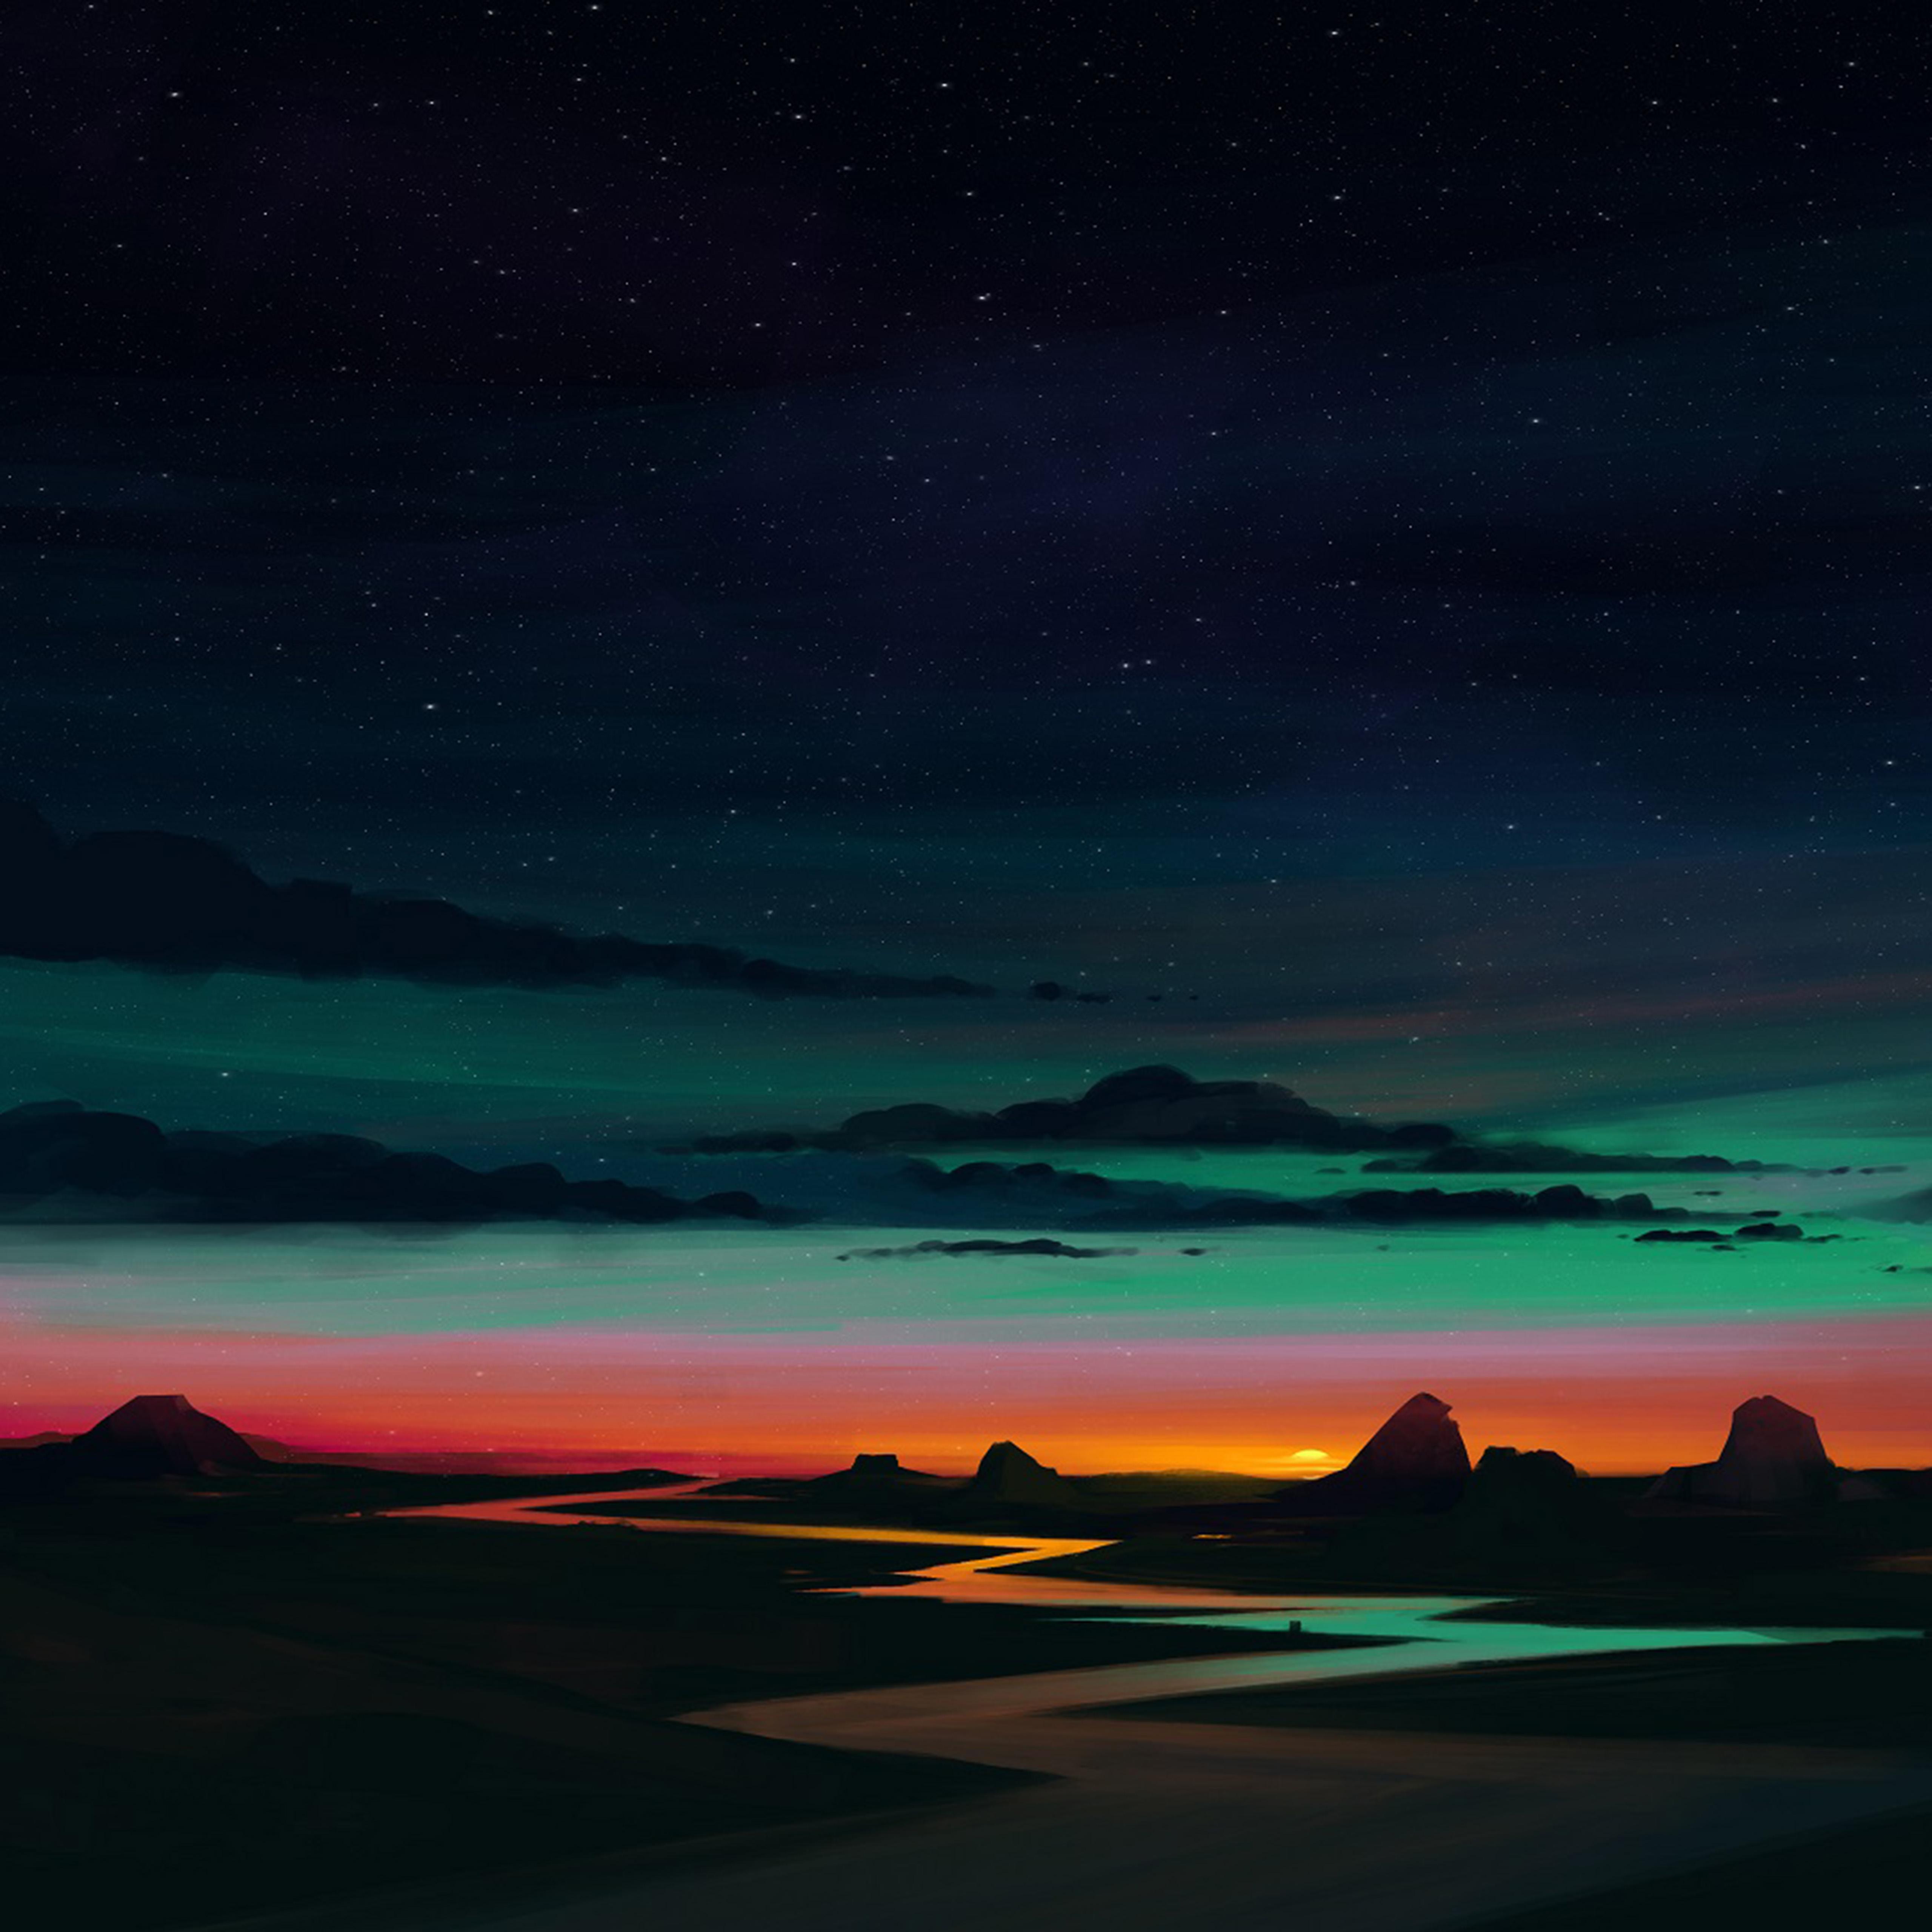 Sunrise wallpaper for iPhone idownloadblog river